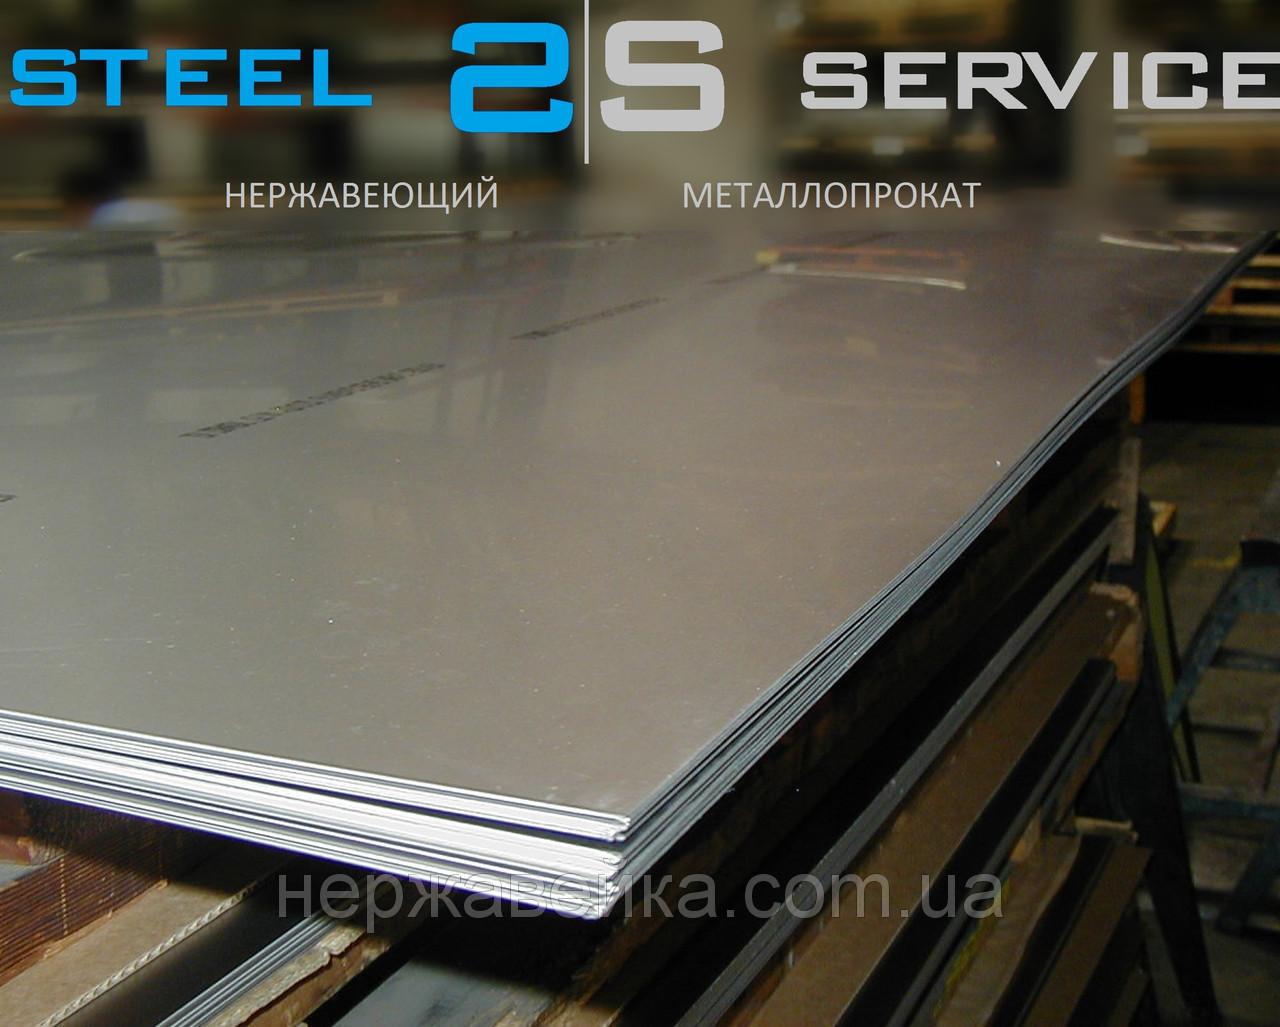 Листовая нержавейка 3х1000х2000мм  AISI 316Ti(10Х17Н13М2Т) 2B - матовый,  кислотостойкий